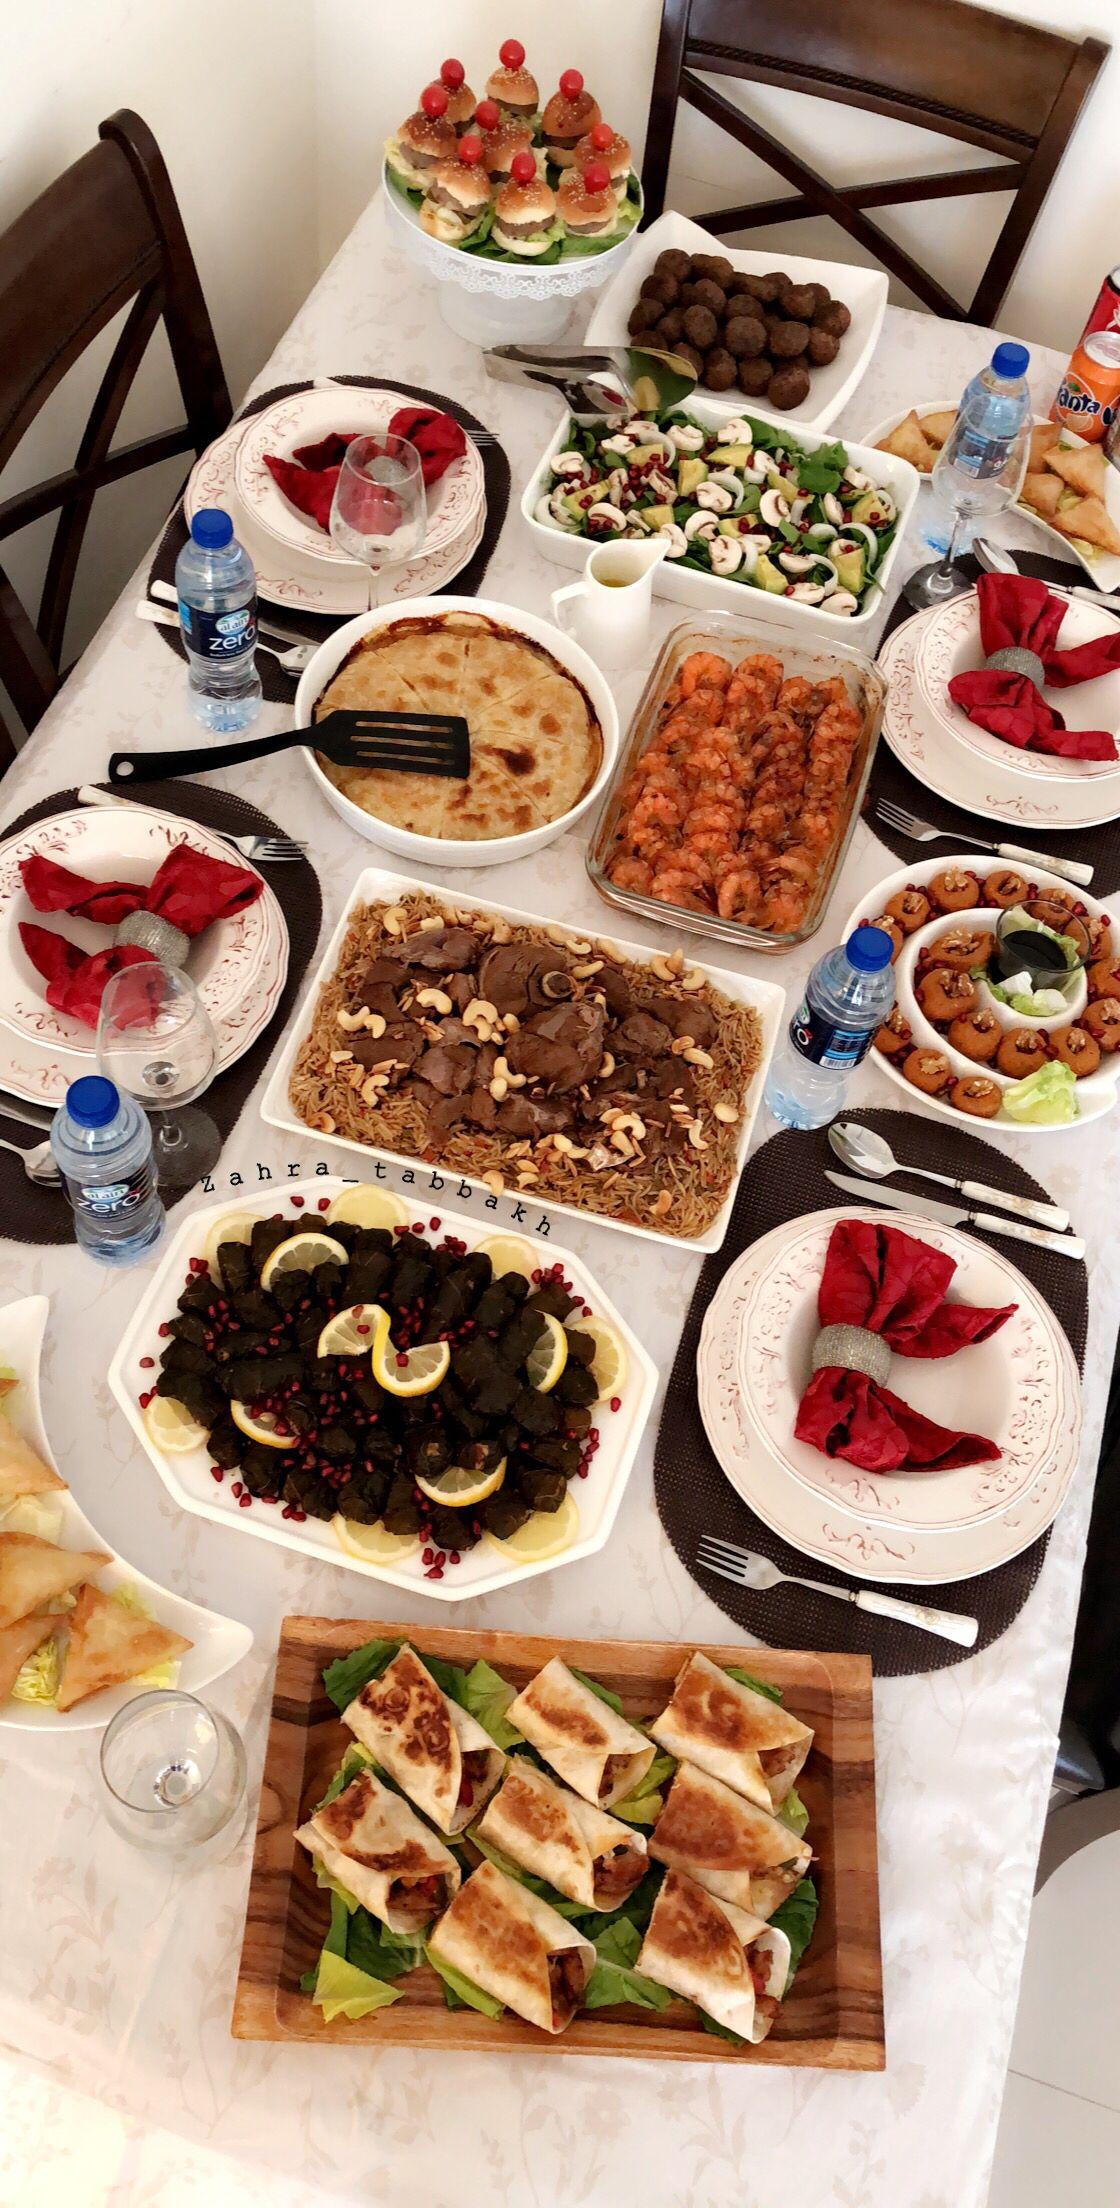 Homedecor ترتيب افكار ترتيب ترتيب طعام ديكور طاولات سفرة طعام أكلات طبخات تزيين طاولات تزيين Tablesettings Fo Eid Food Food Snapchat Instagram Food